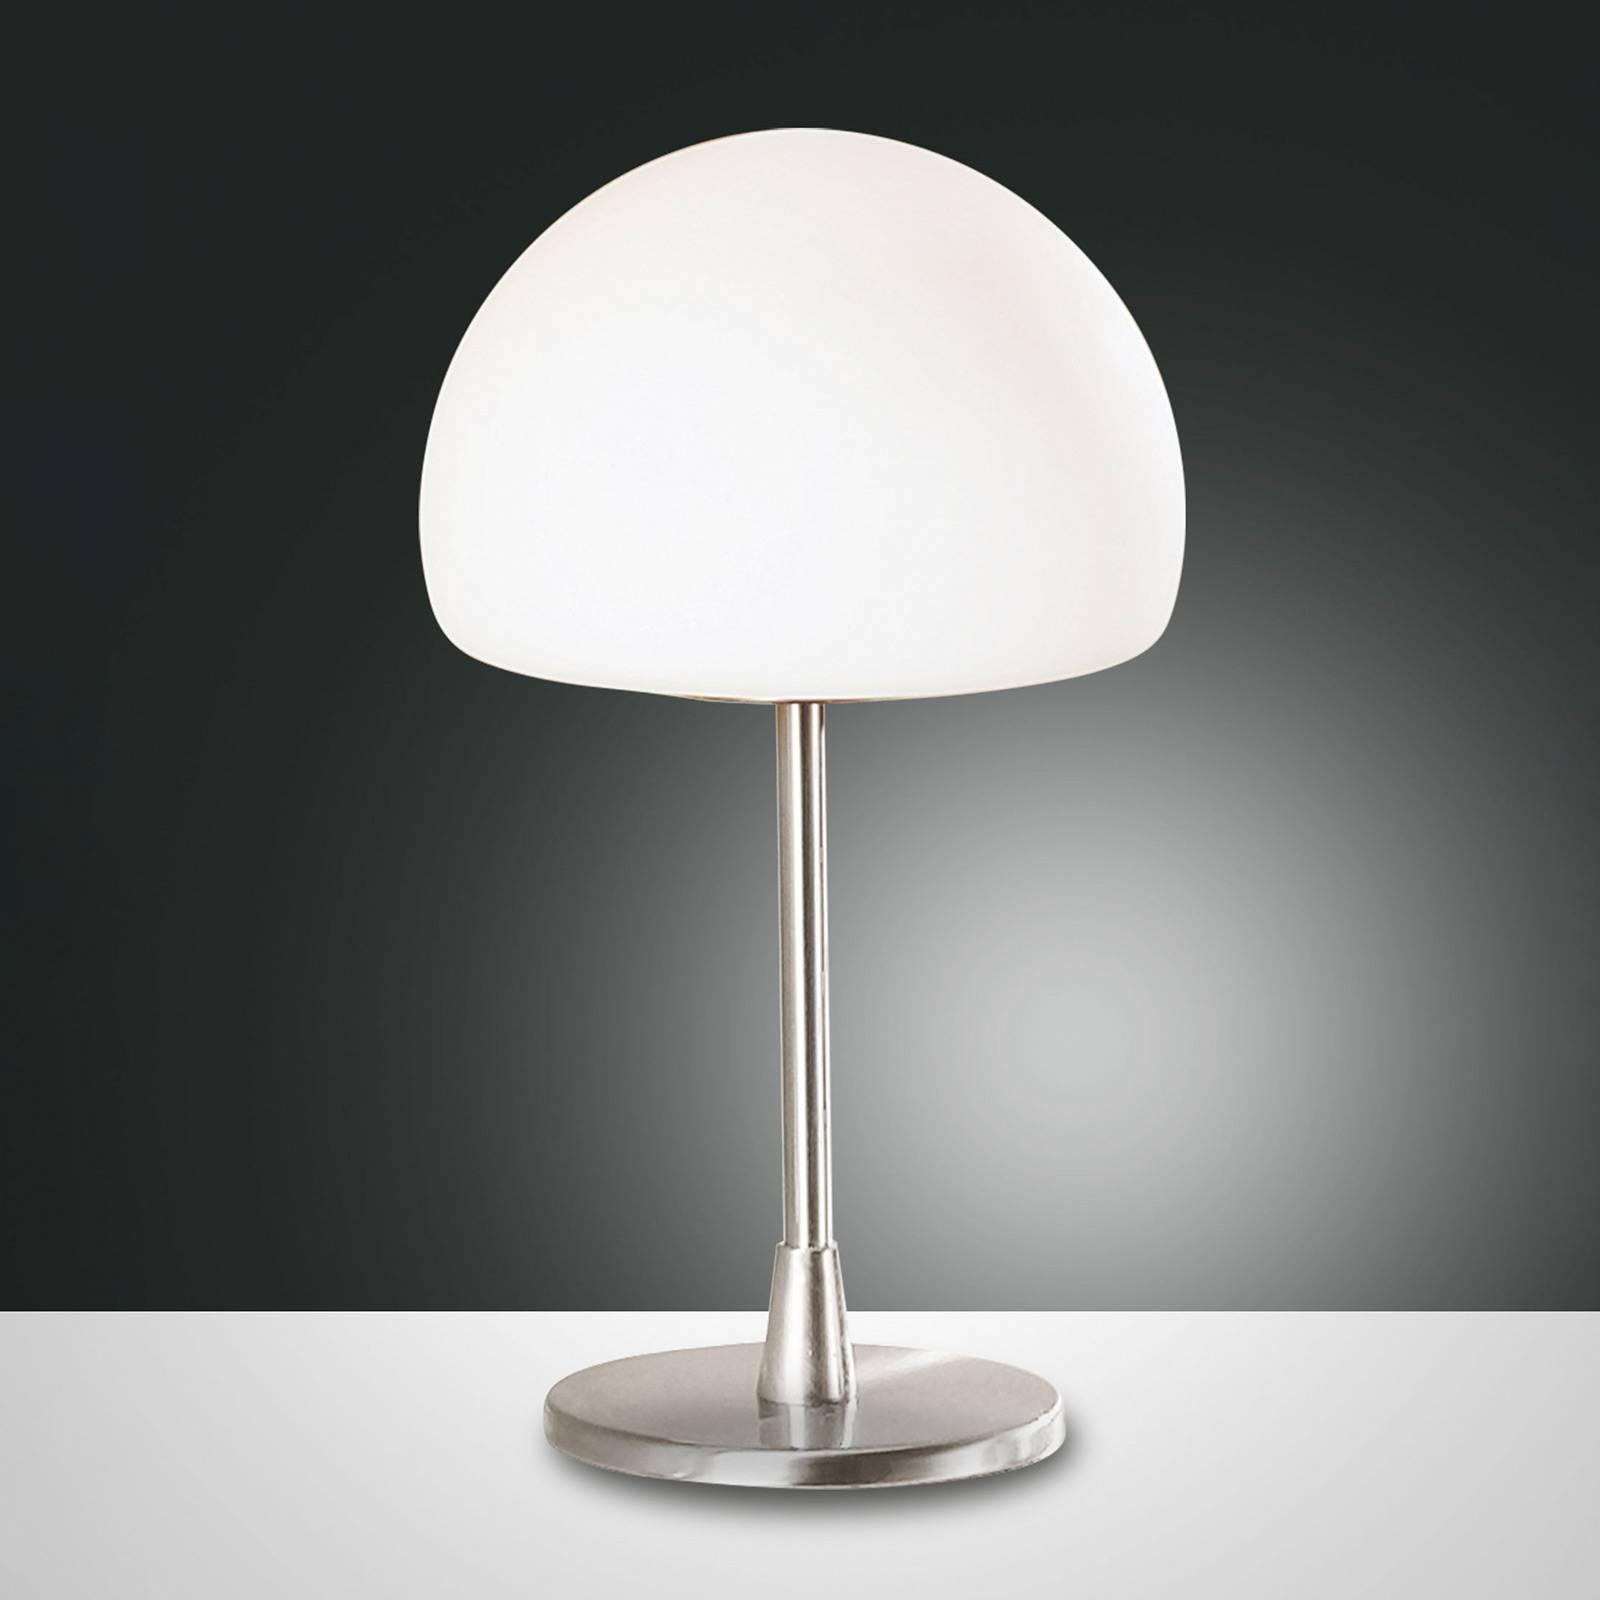 LED tafellamp Gaia met touchdimmer, chroom